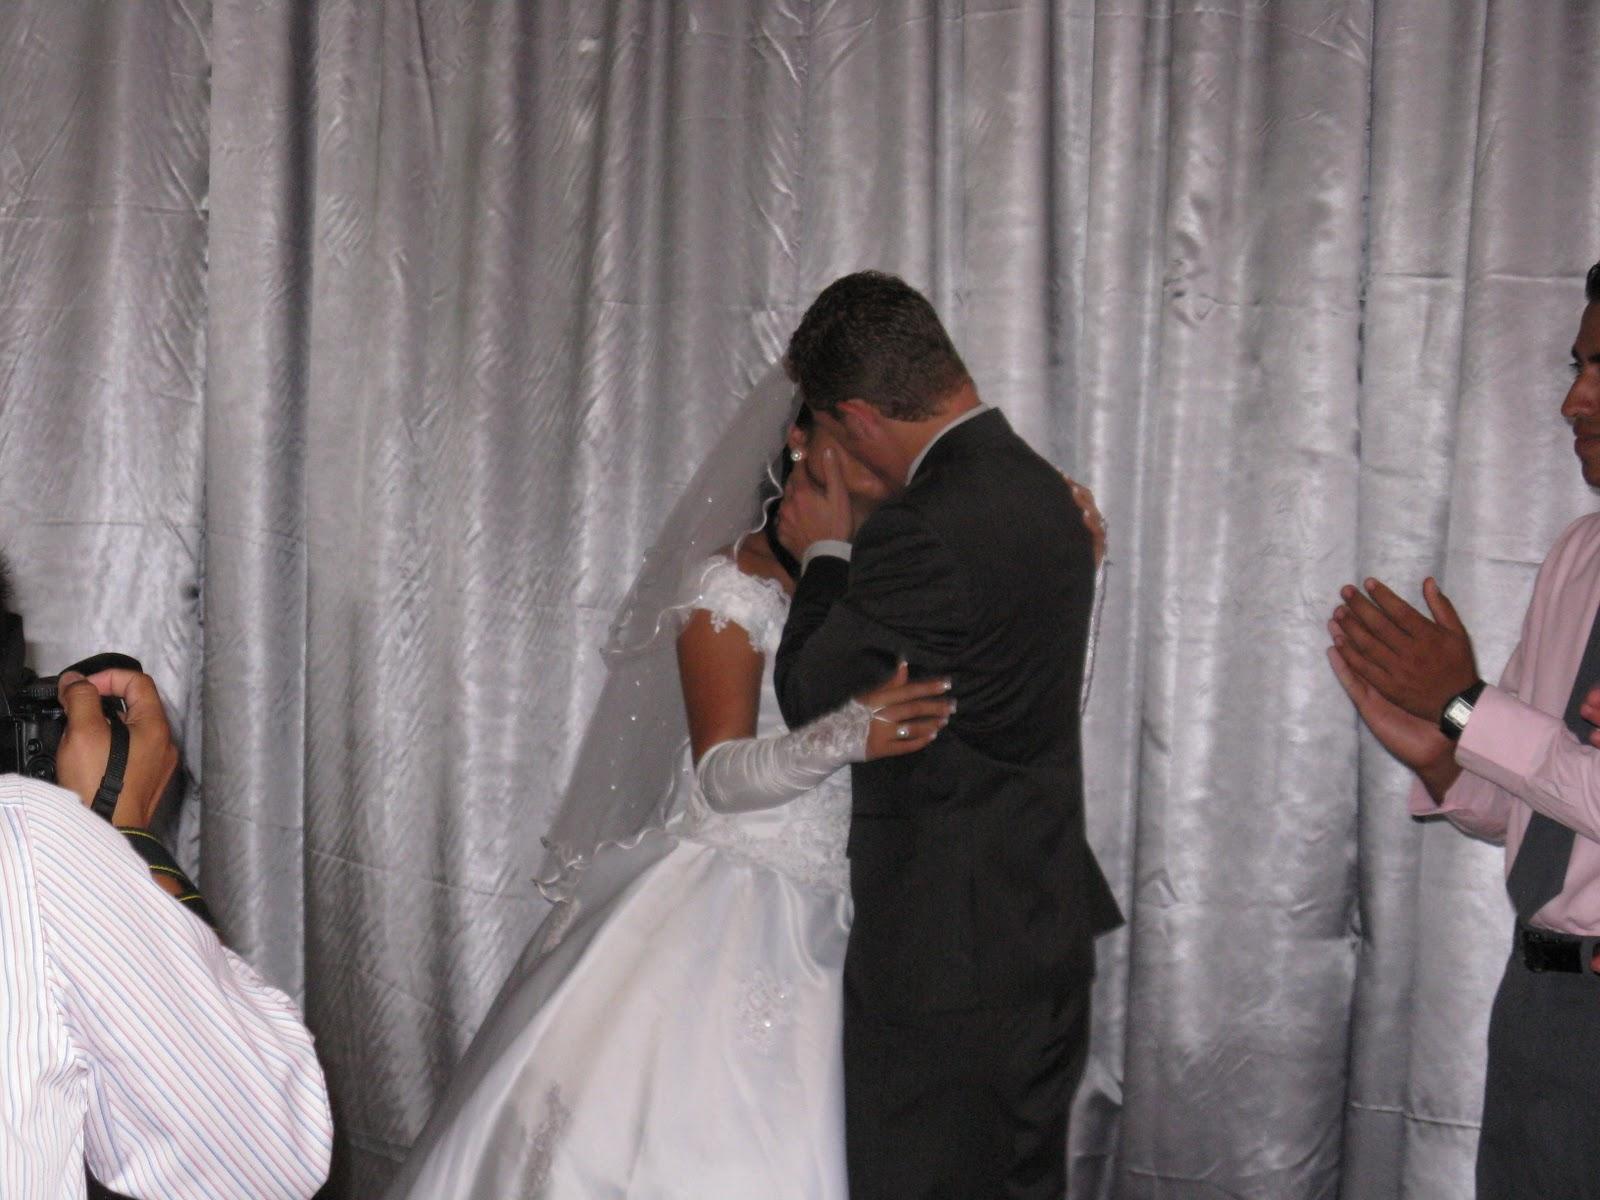 honduran wedding traditions